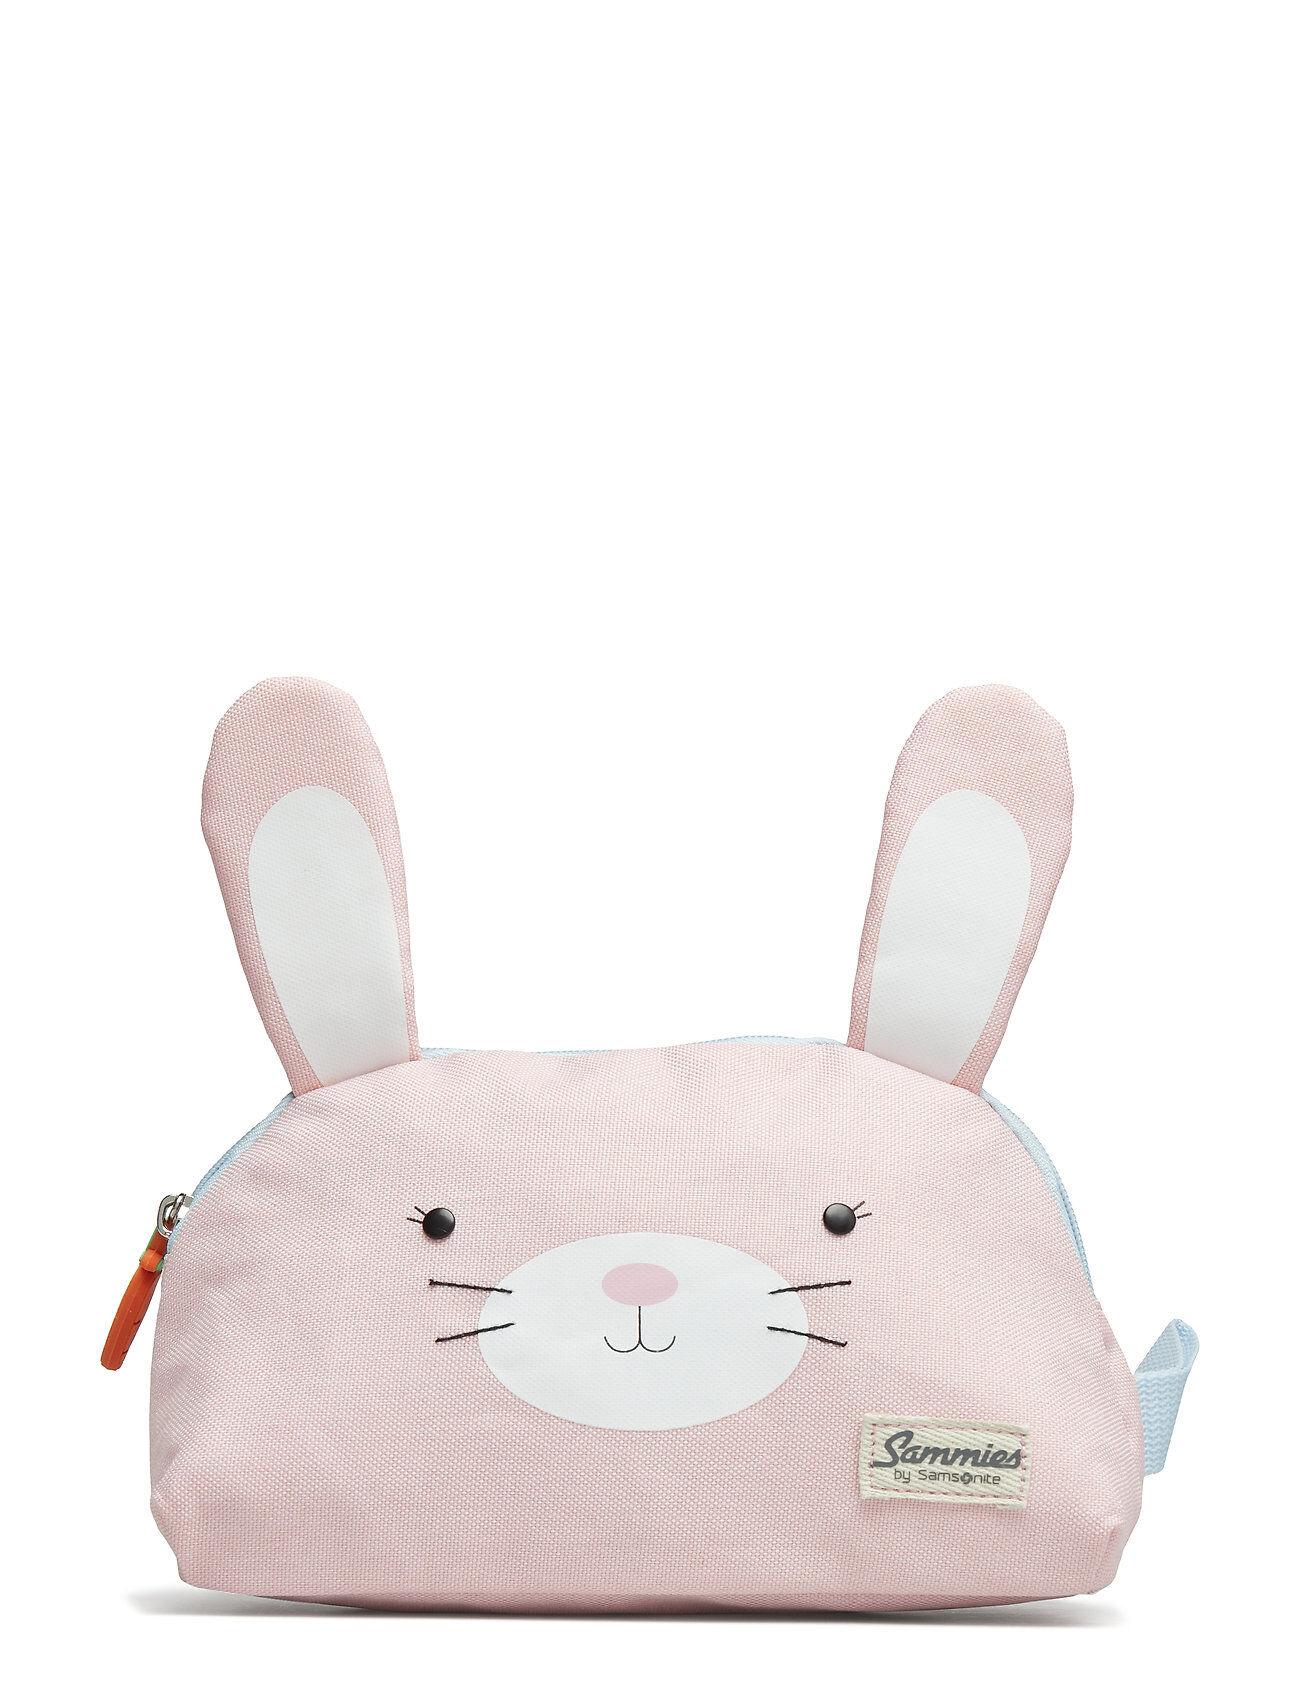 Samsonite Happy Sammies Toilet Kit Rabbit Rosie